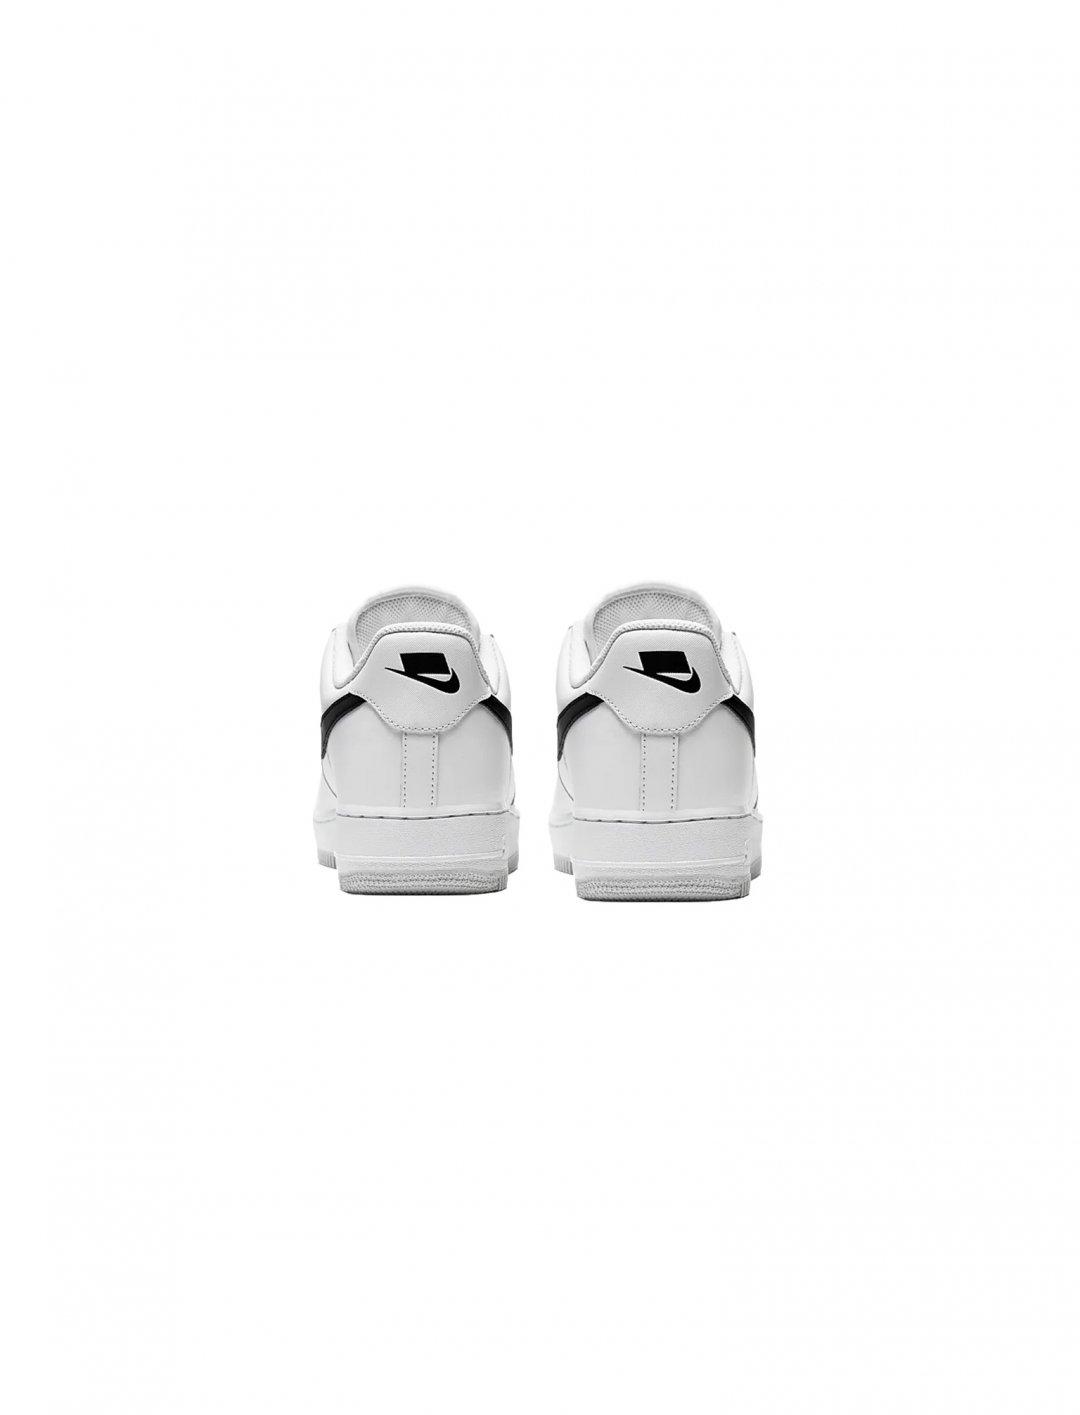 White Trainers  Nike